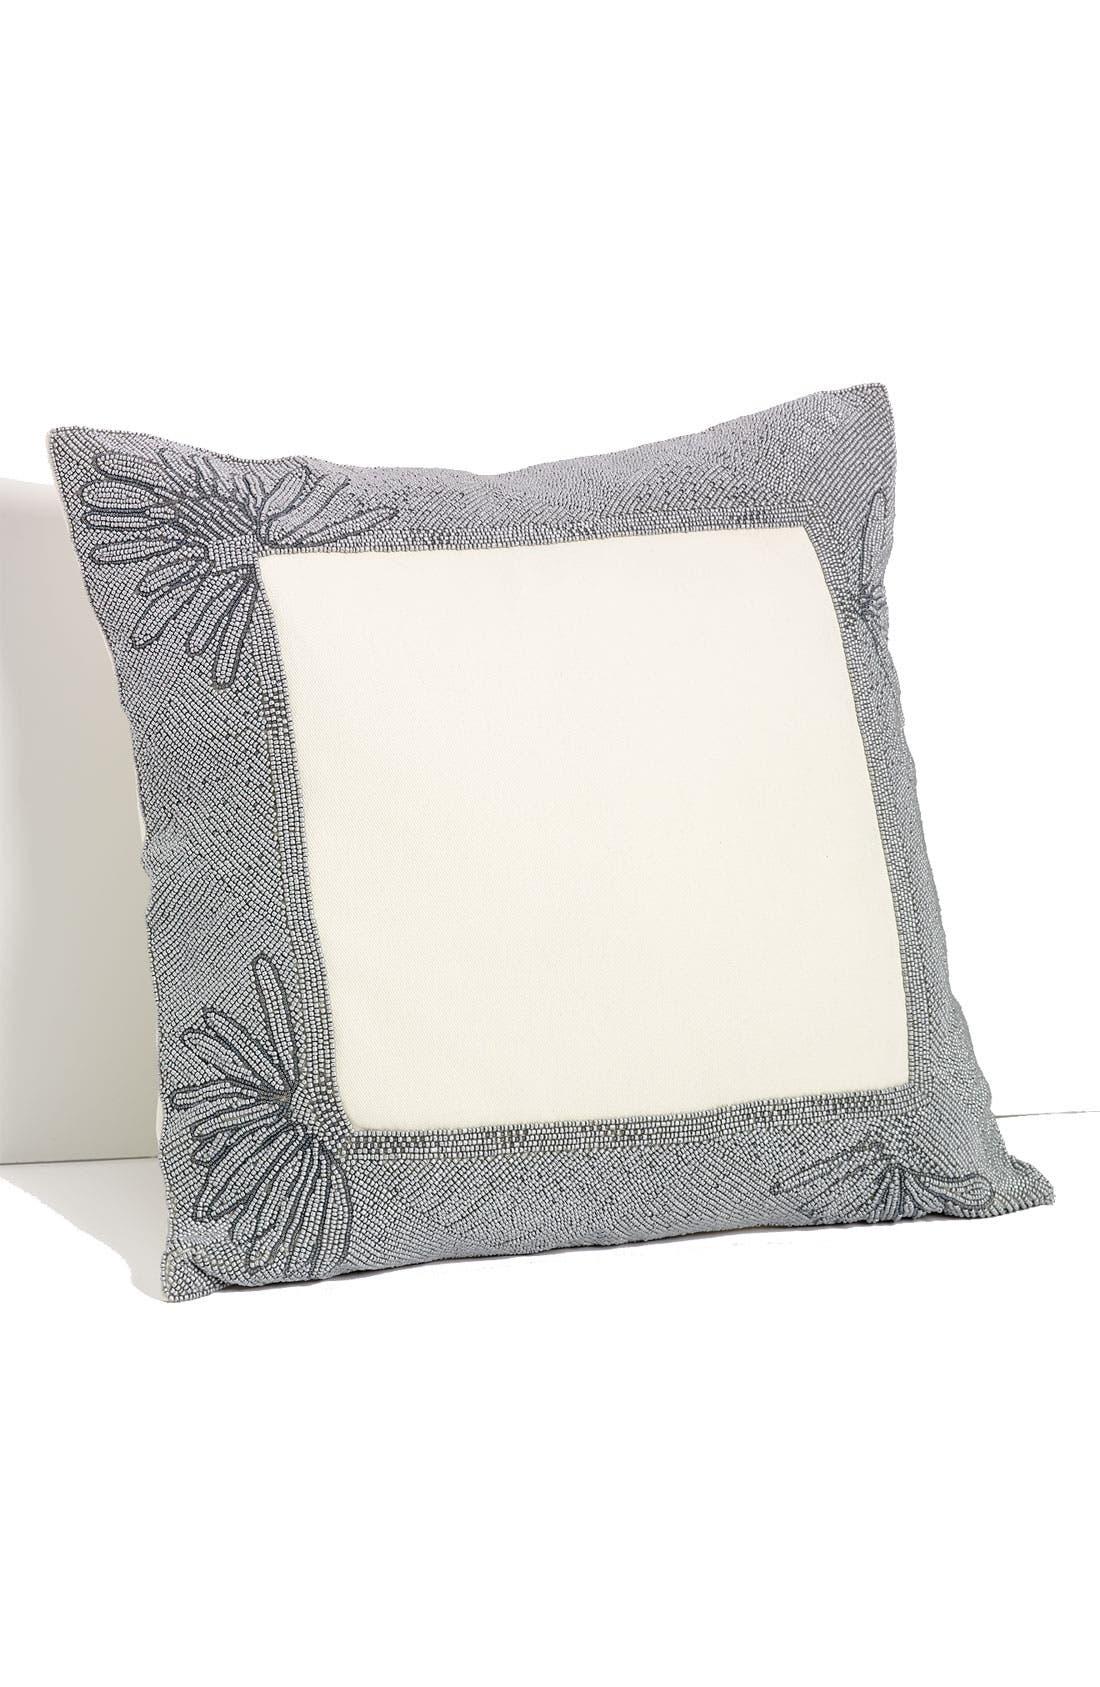 Alternate Image 1 Selected - Diane von Furstenberg 'Beaded Border' Pillow